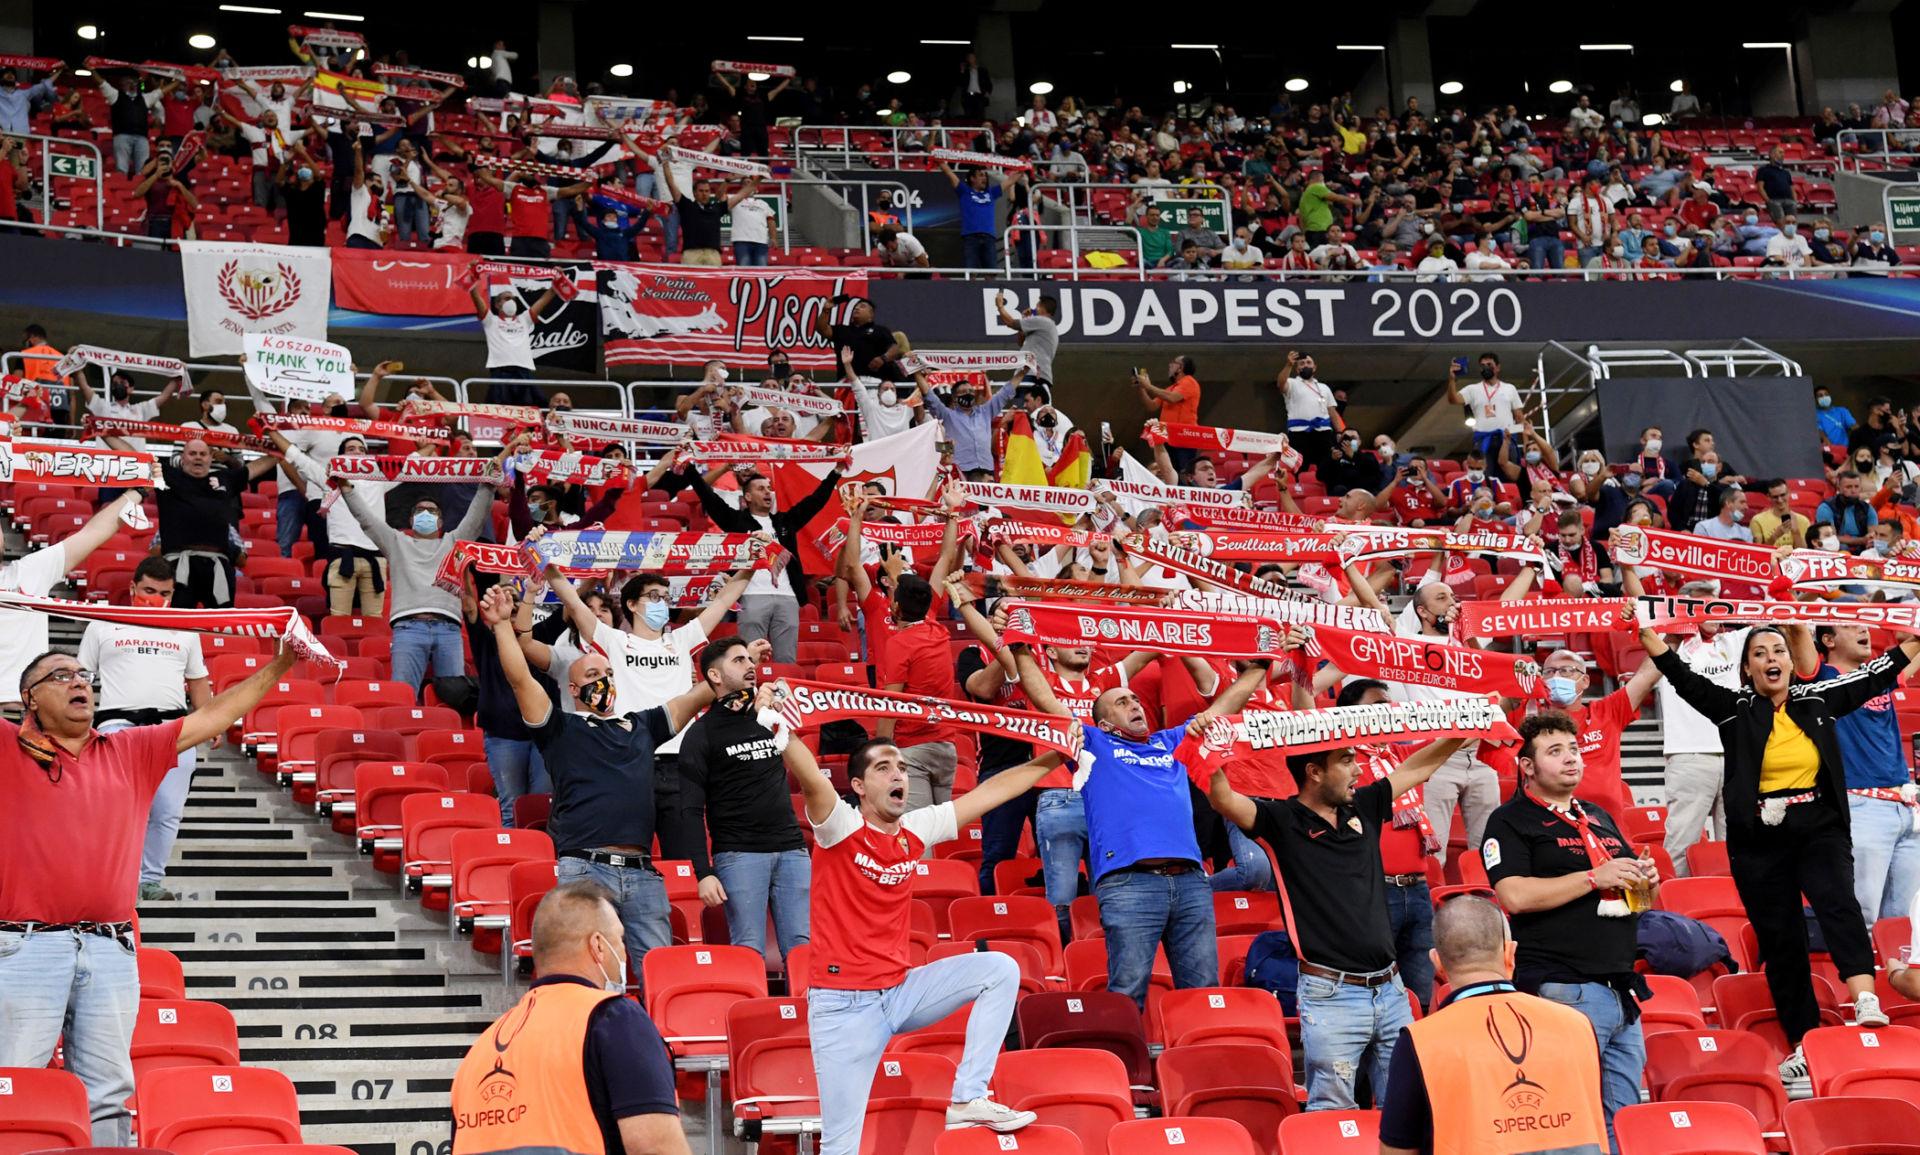 Thắng Sevilla 2-1, Bayern Munich đoạt UEFA Super Cup 2020